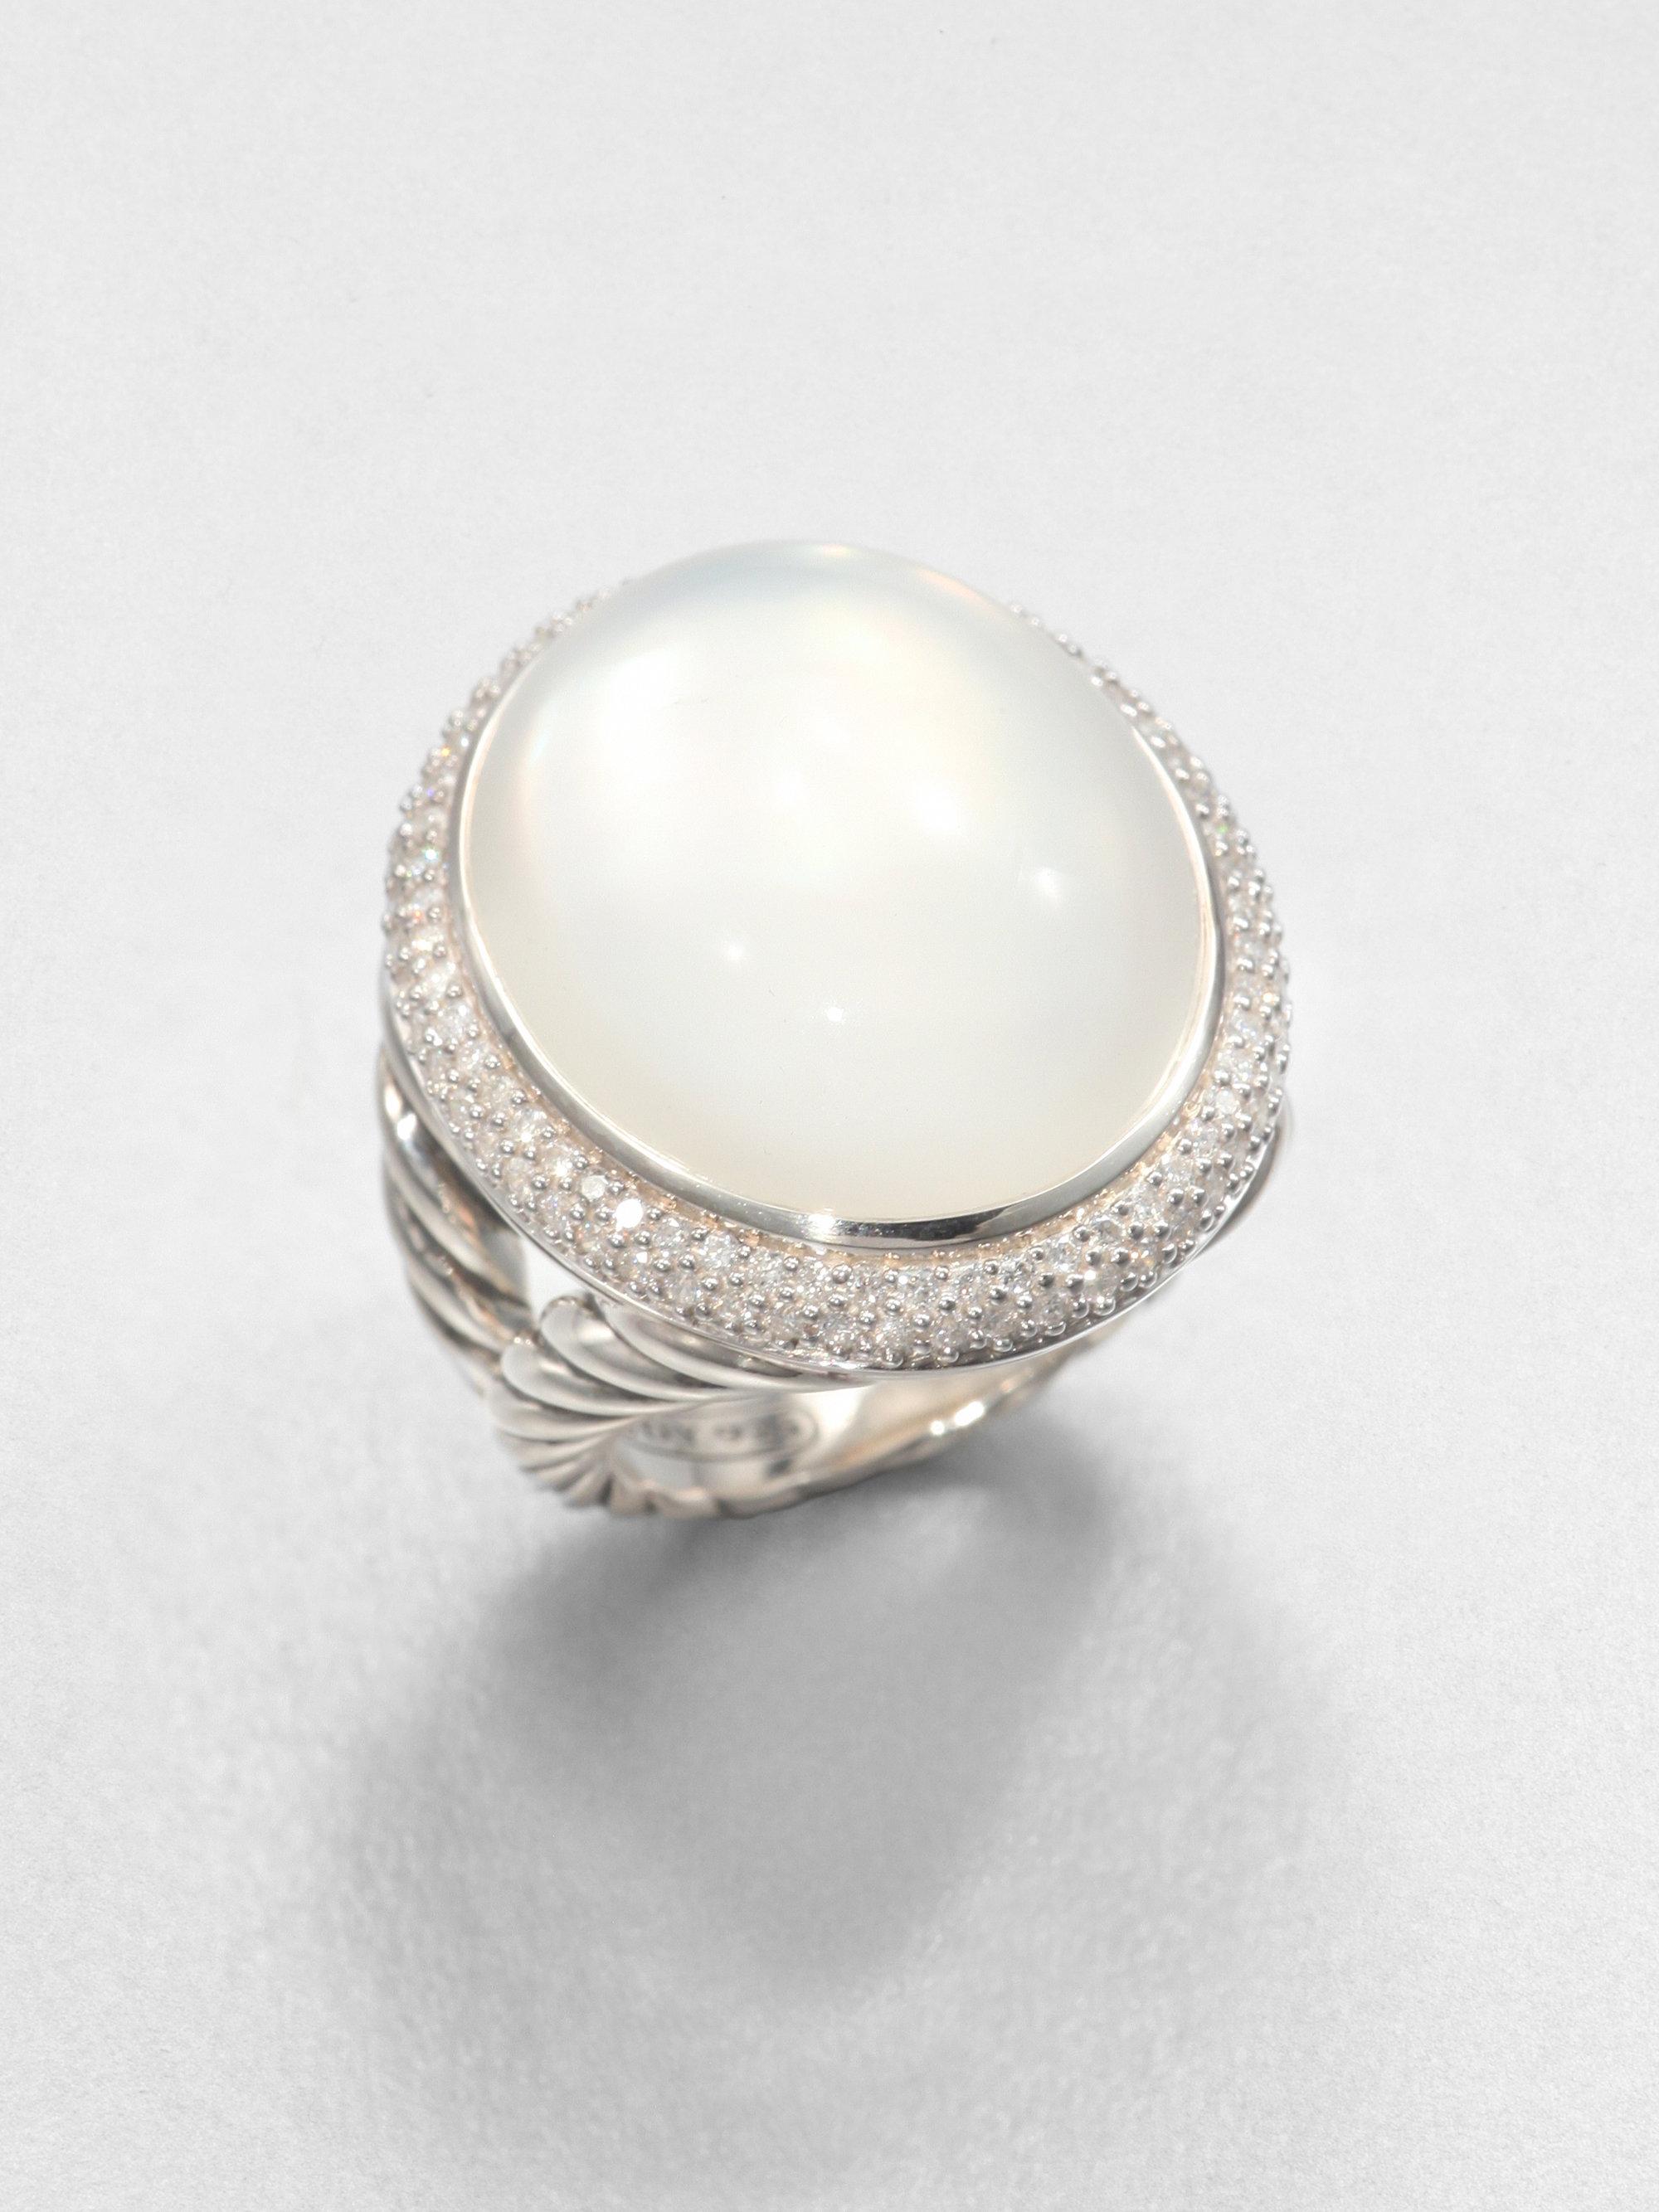 david yurman moonquartz and sterling silver ring